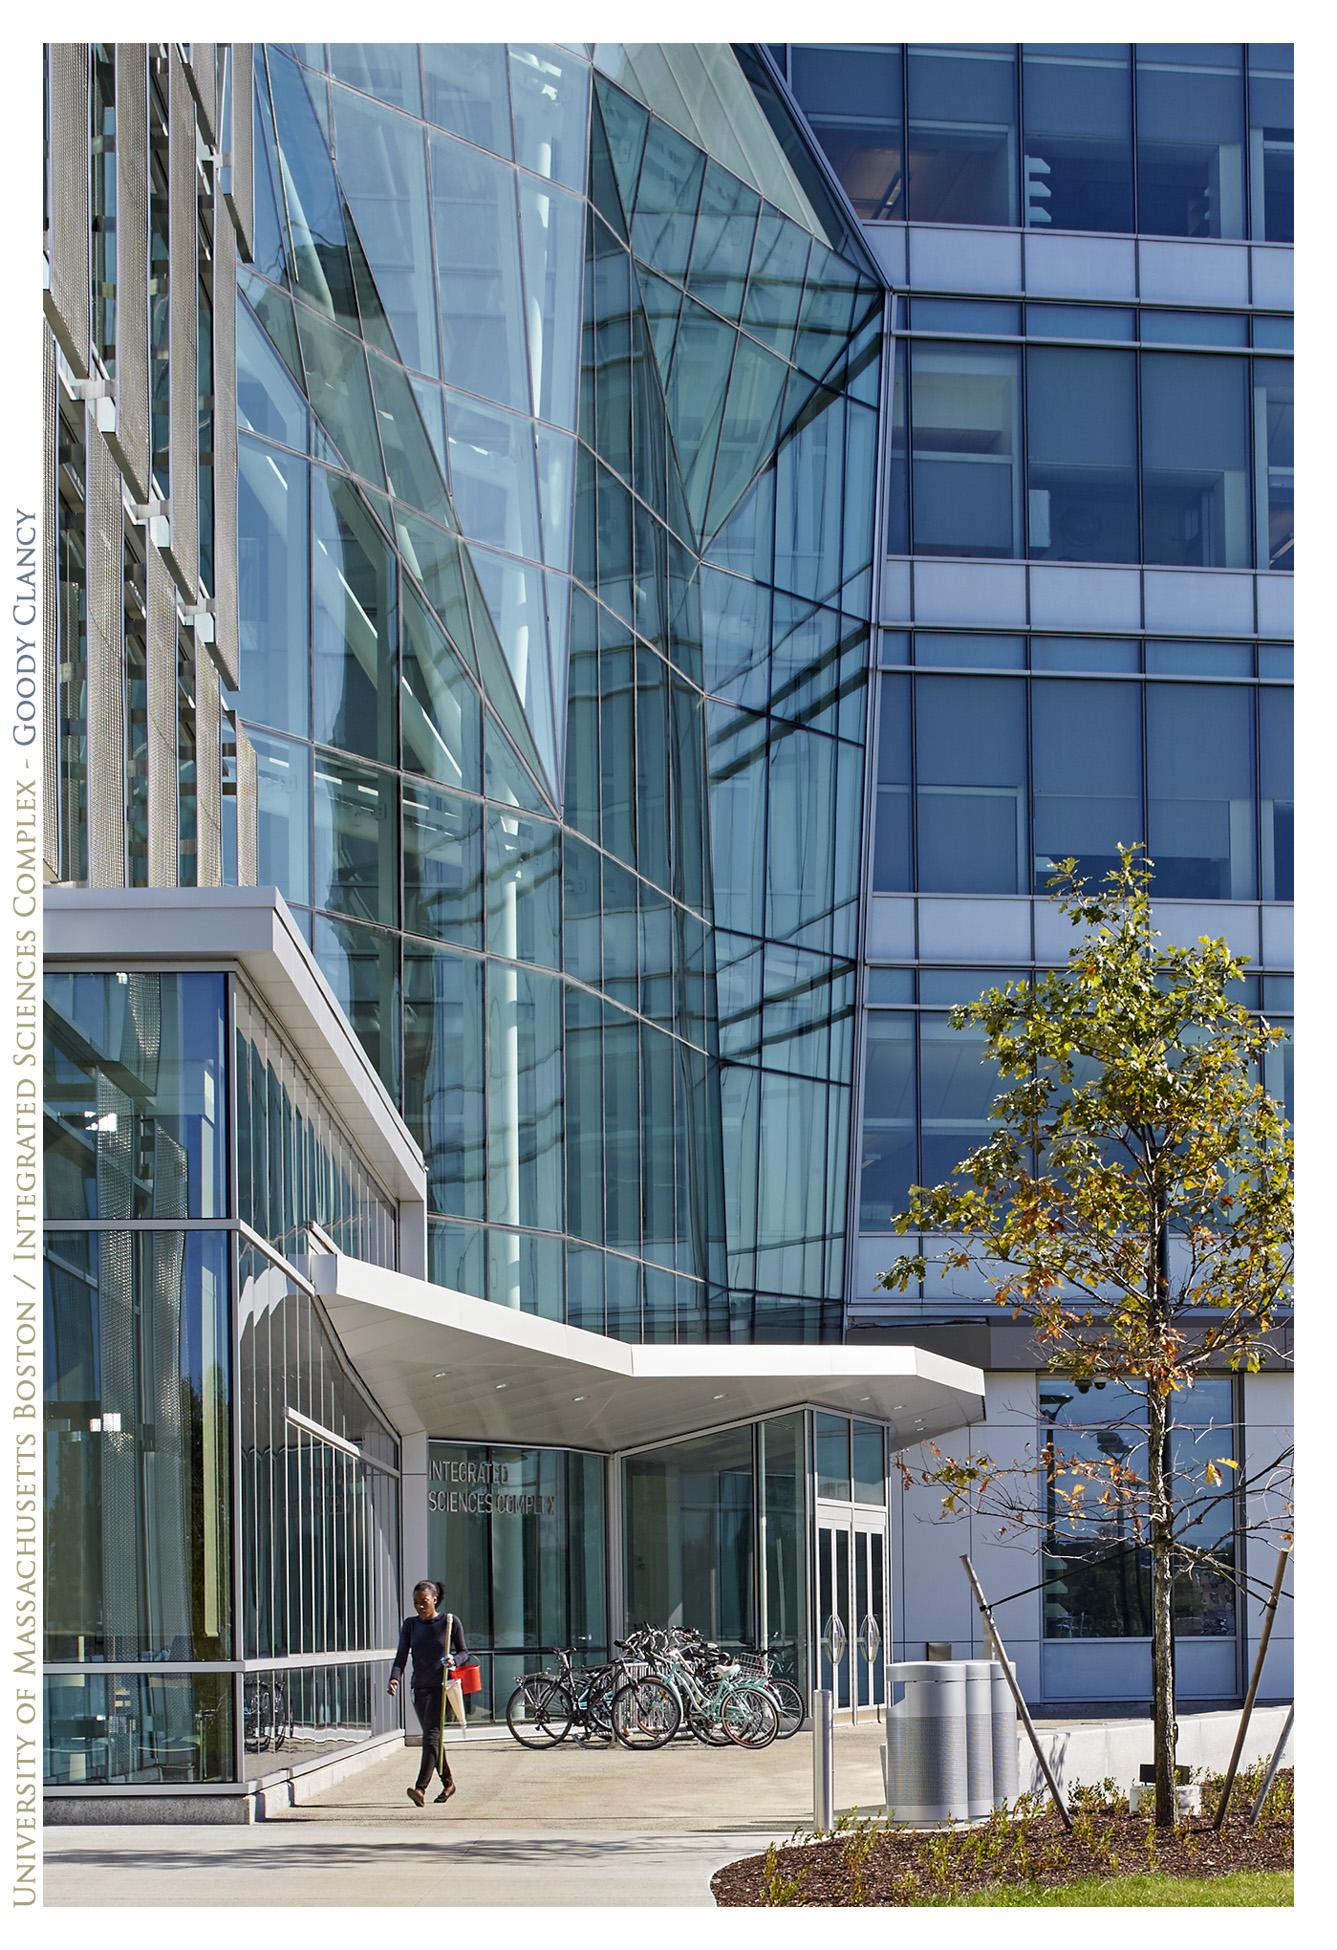 002_Robert-Benson-Photography-Goody-Clancy-UMASS-Boston-Integrated-Science-Complex-34.jpg